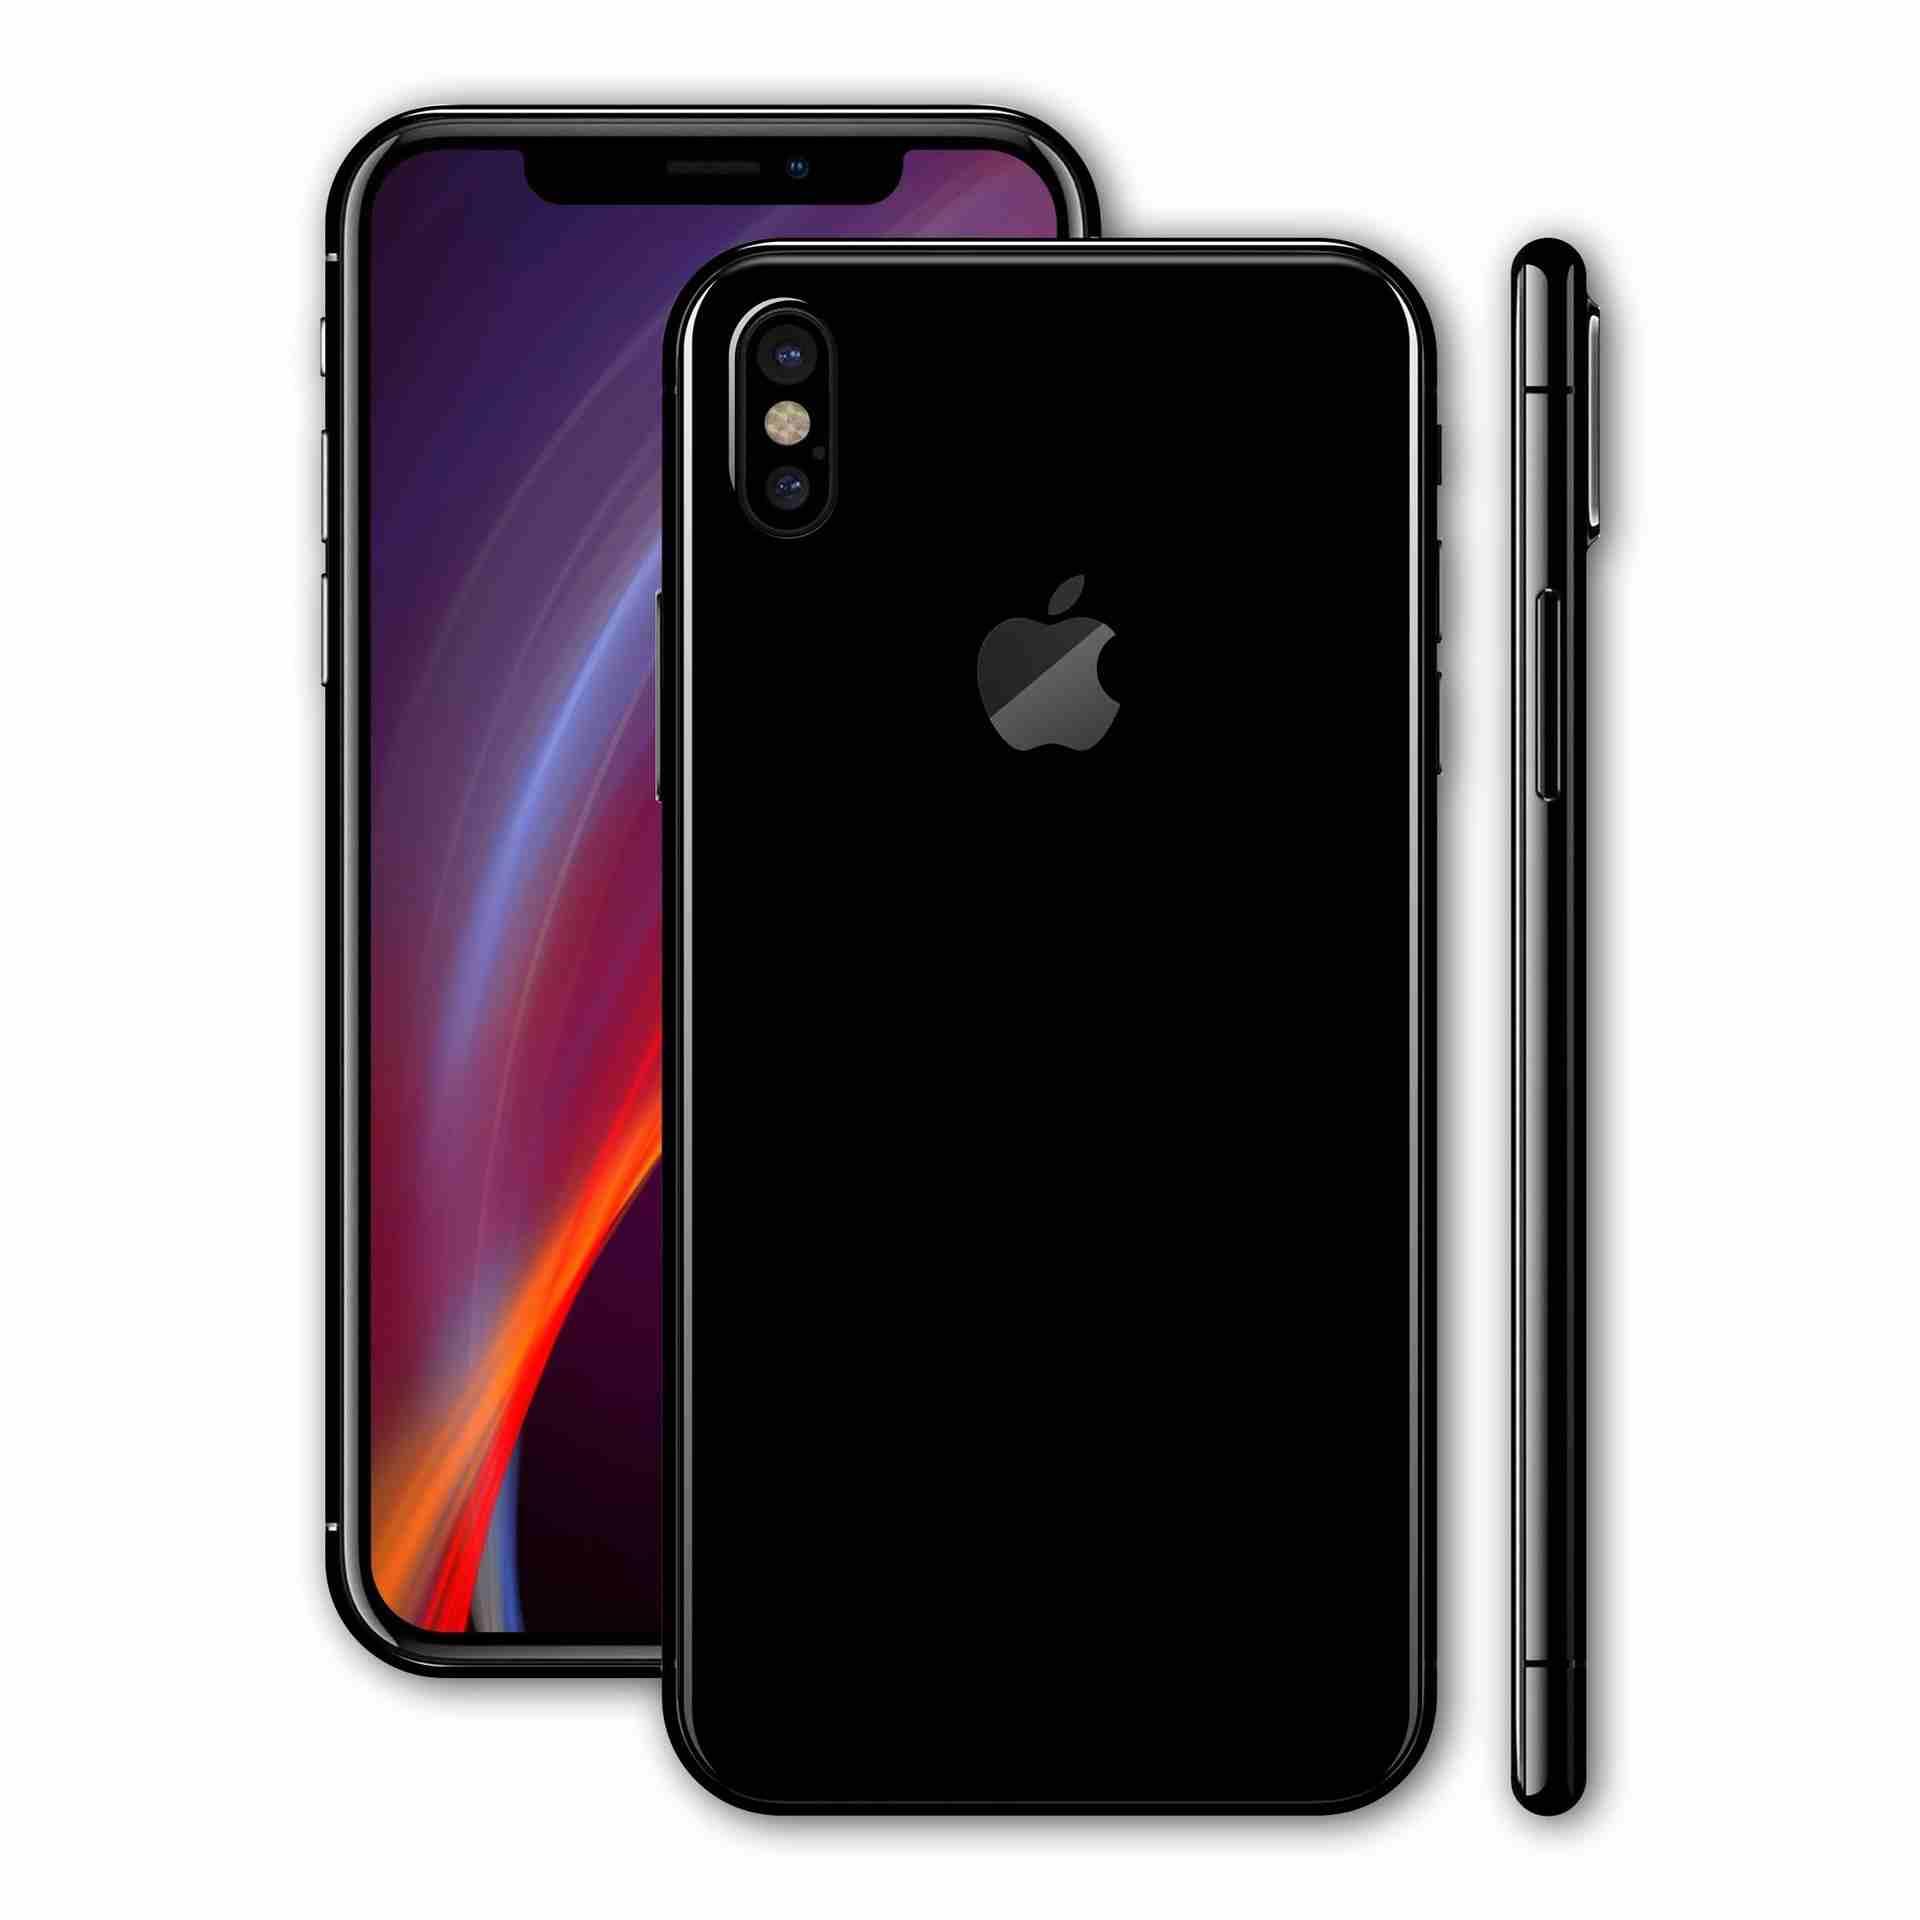 iphone 11 pro max 256GB-  iphone x للبيع او للبدل...